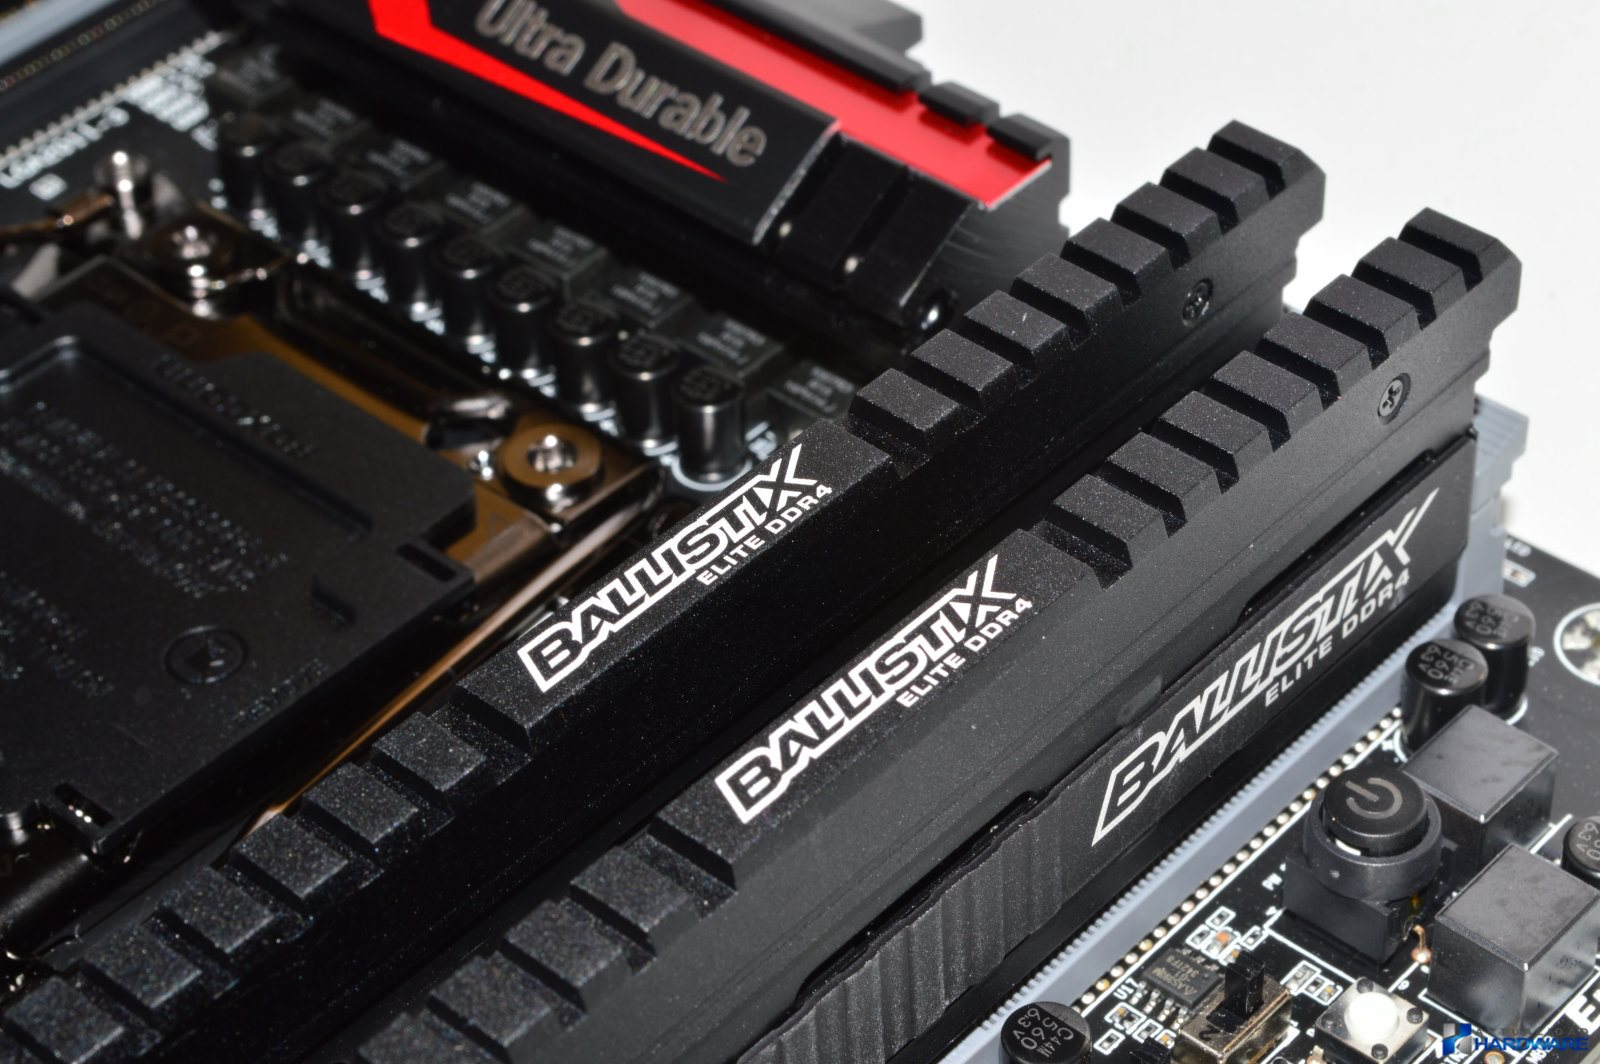 REVIEW: CRUCIAL BALLISTIX ELITE DDR4   ACTUALIDAD HARDWARE